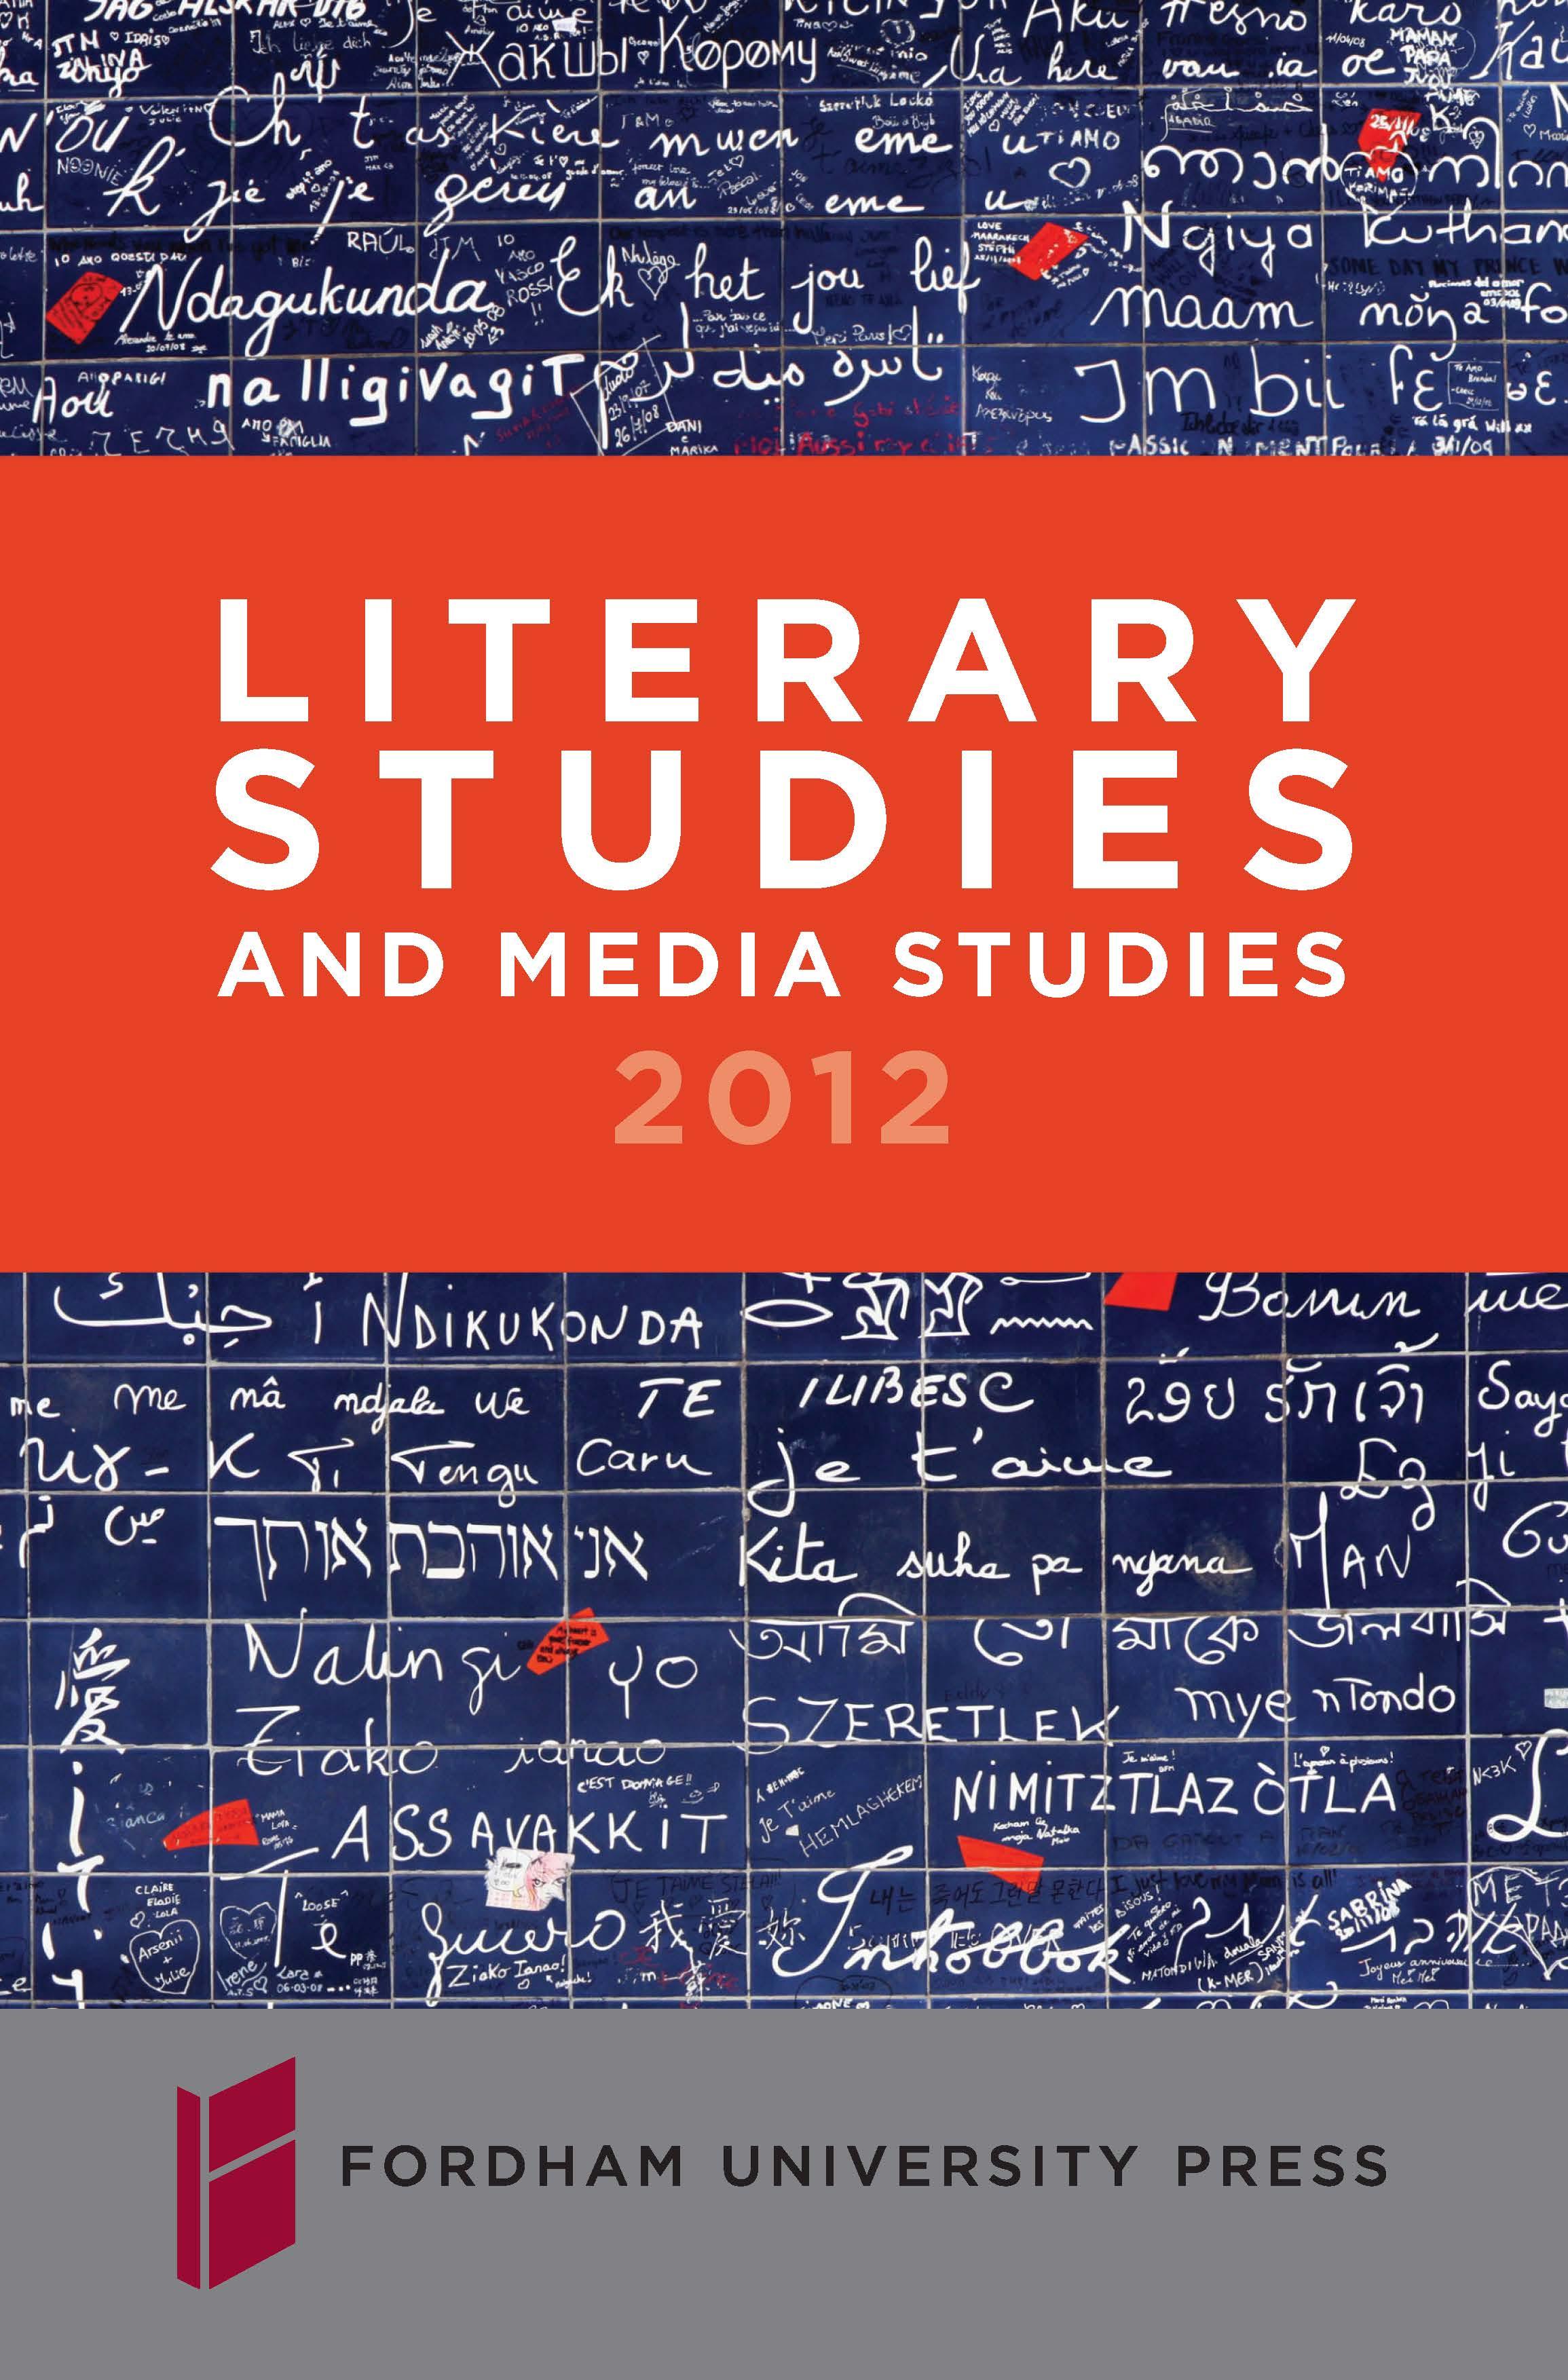 Literary Studies 2012